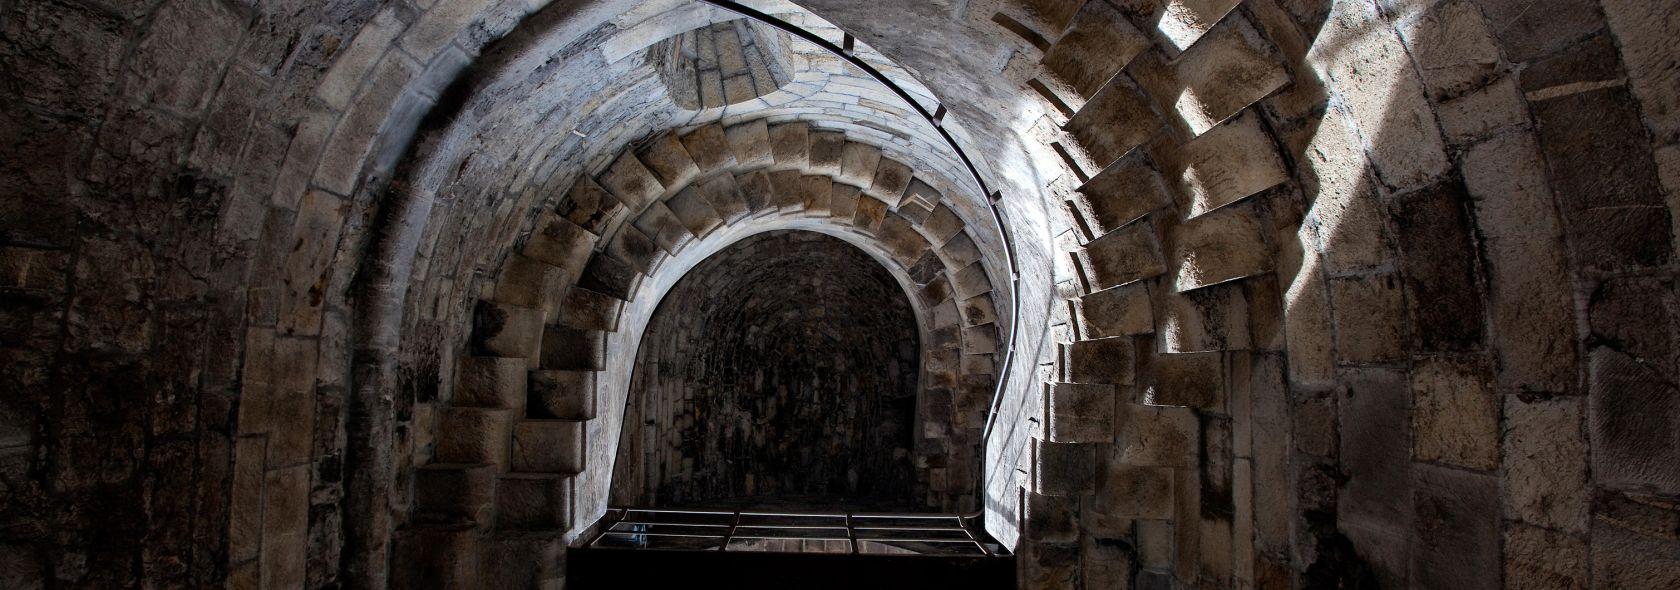 Porta Soprana - Foto Stefano Goldberg ©publifoto